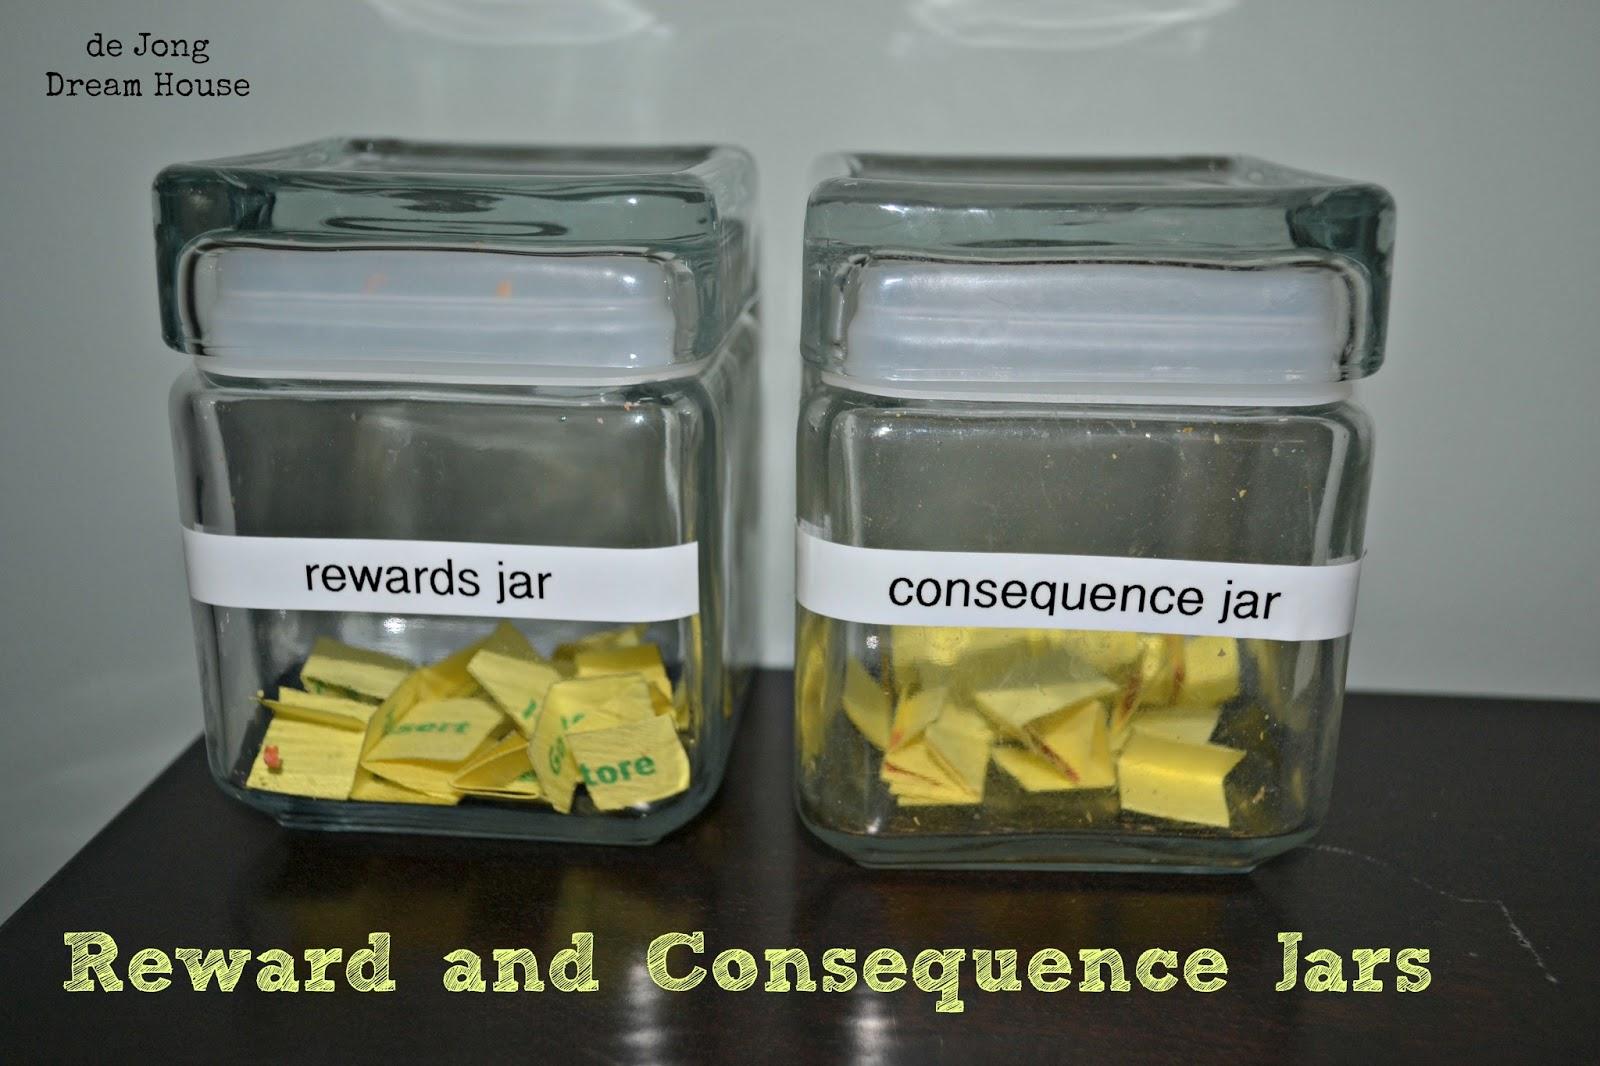 De Jong Dream House Reward And Consequence Jars